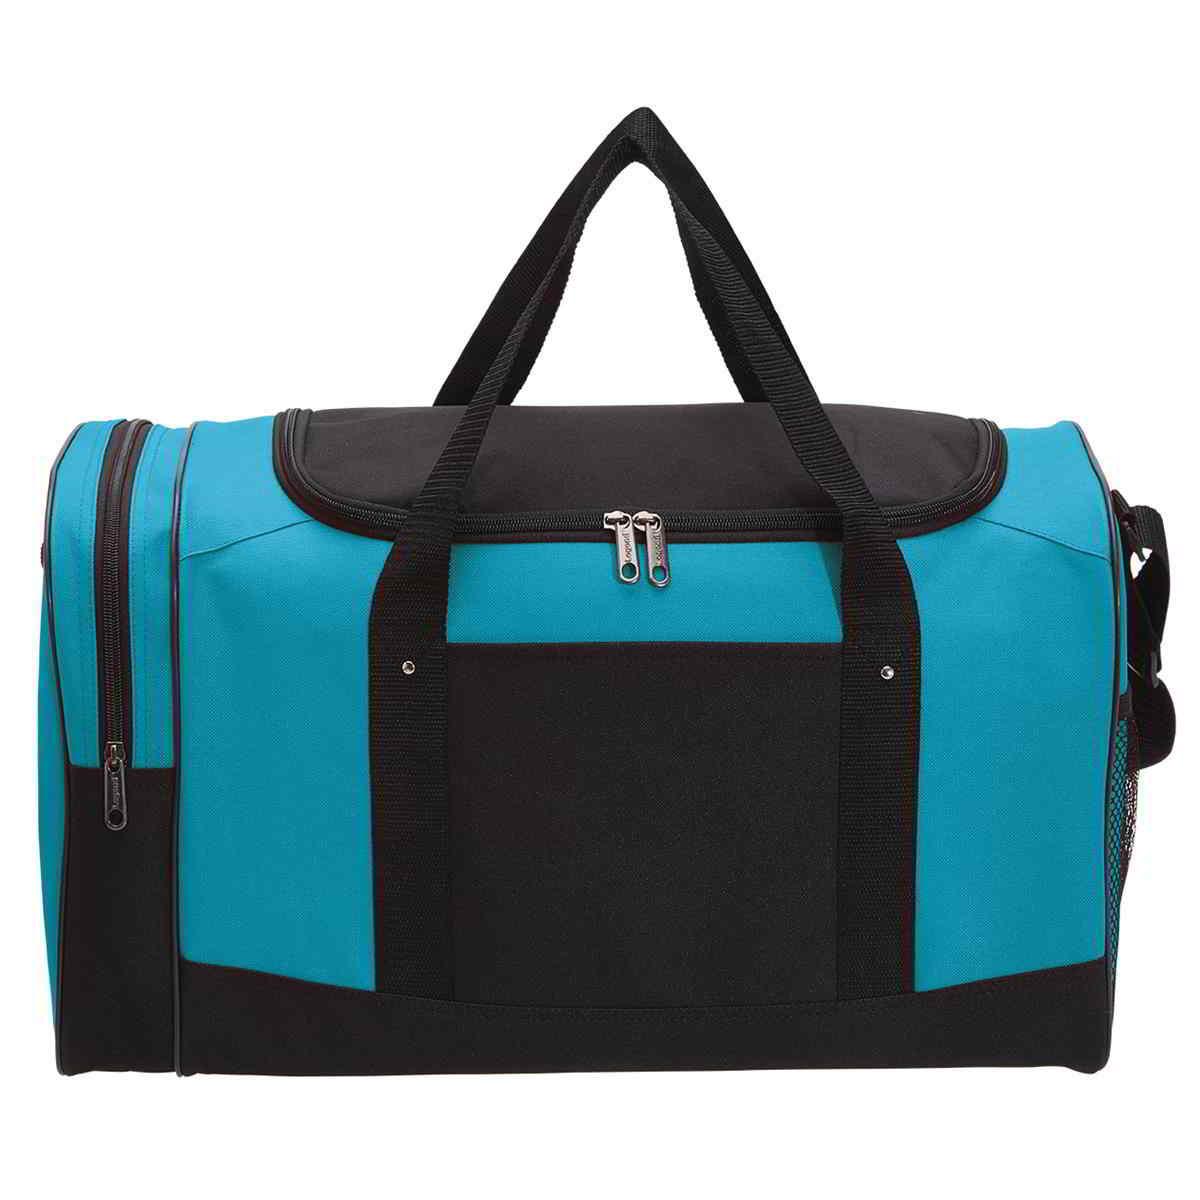 1222 Aua Black Spark Sports Bag